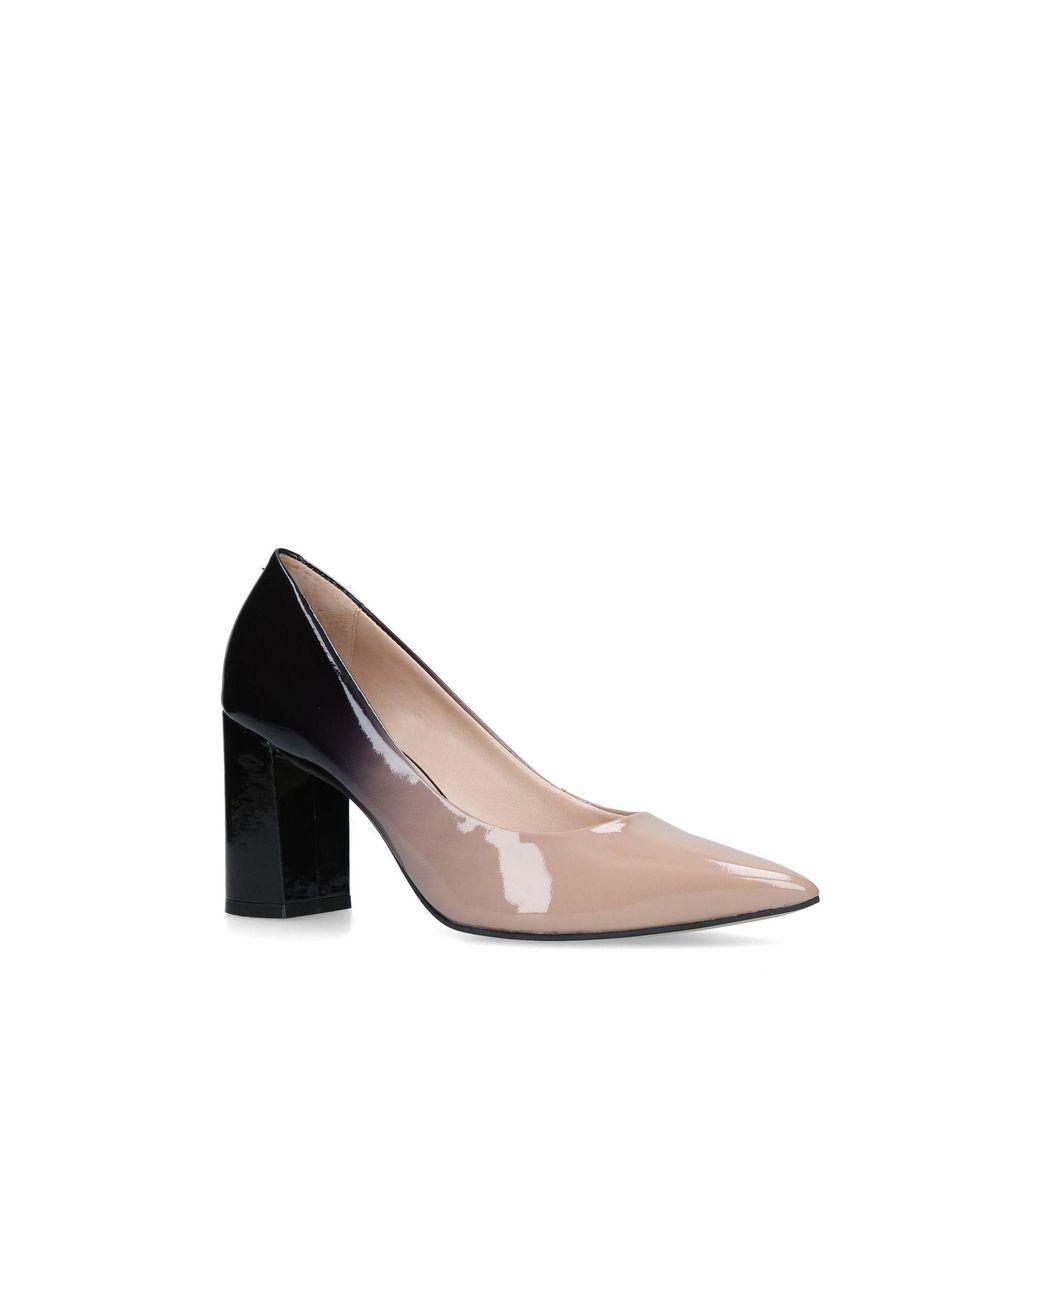 9dca5b041c7 Carvela Kurt Geiger. Women s Natural Nude  albert  Block Heel Court Shoes